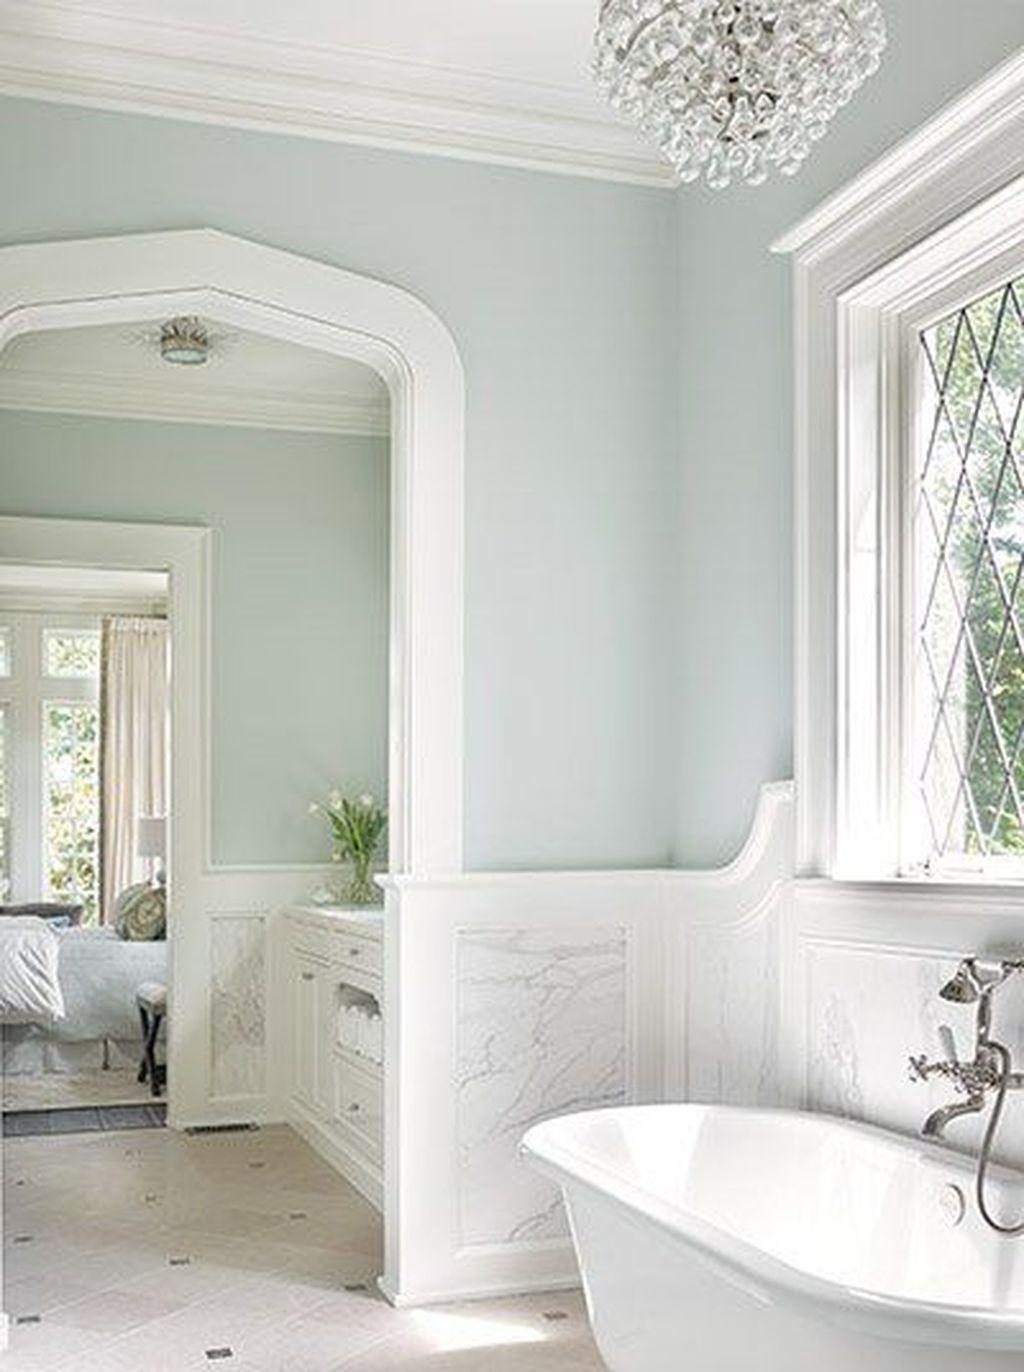 41 Beautiful Classic Bathroom Design Ideas | Bathroom | Pinterest ...